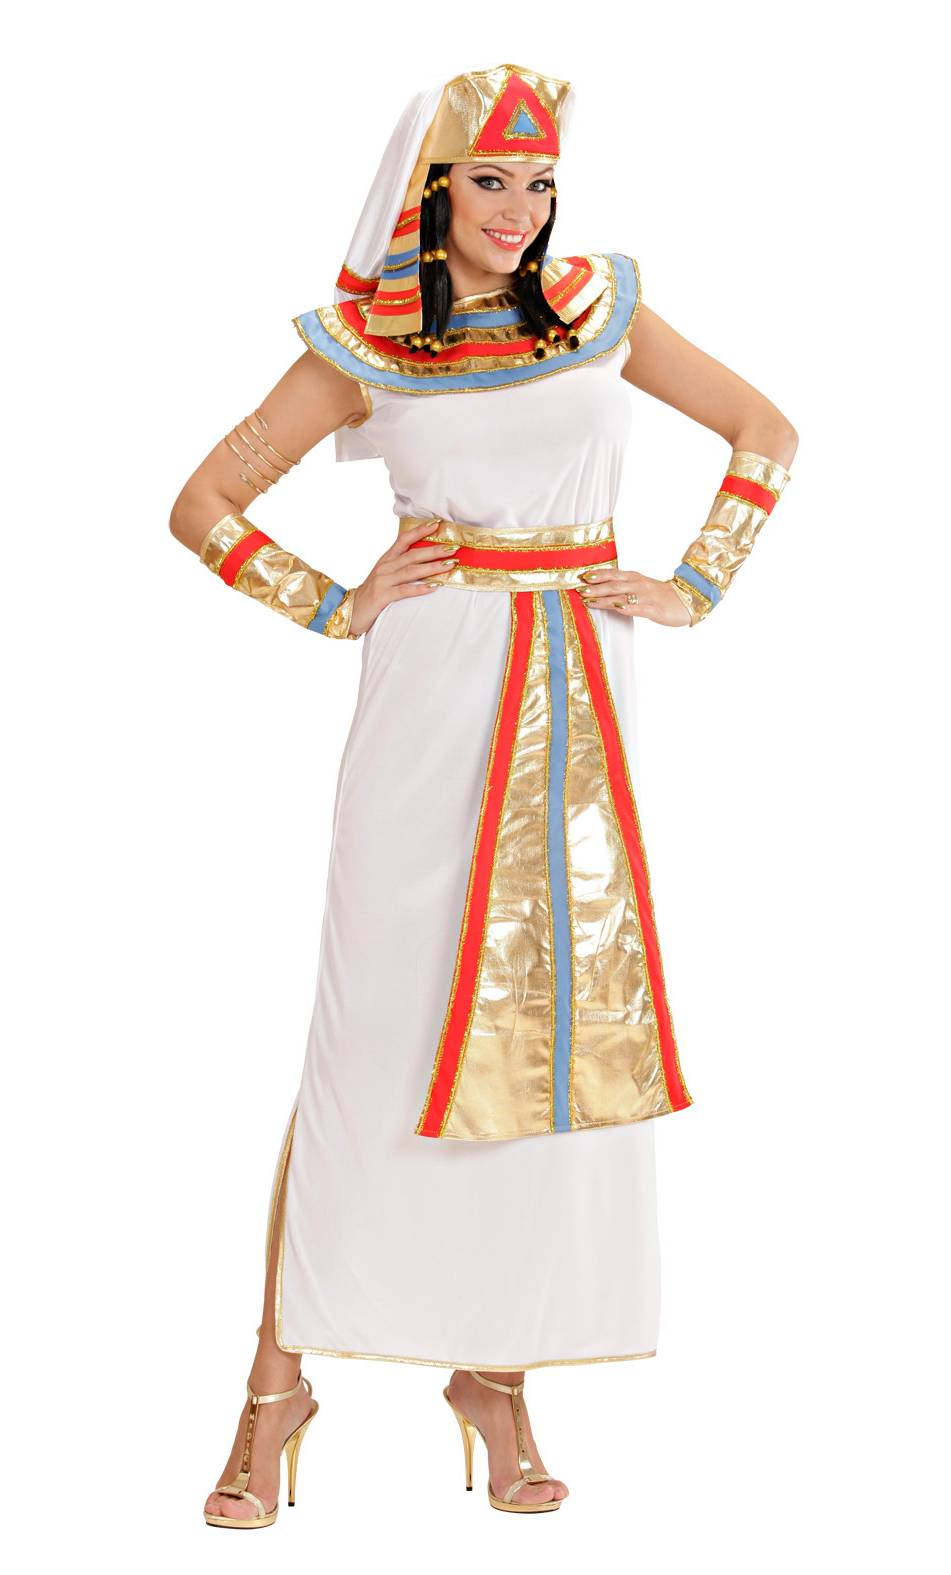 Costume-Egyptienne-Reine-du-Nil